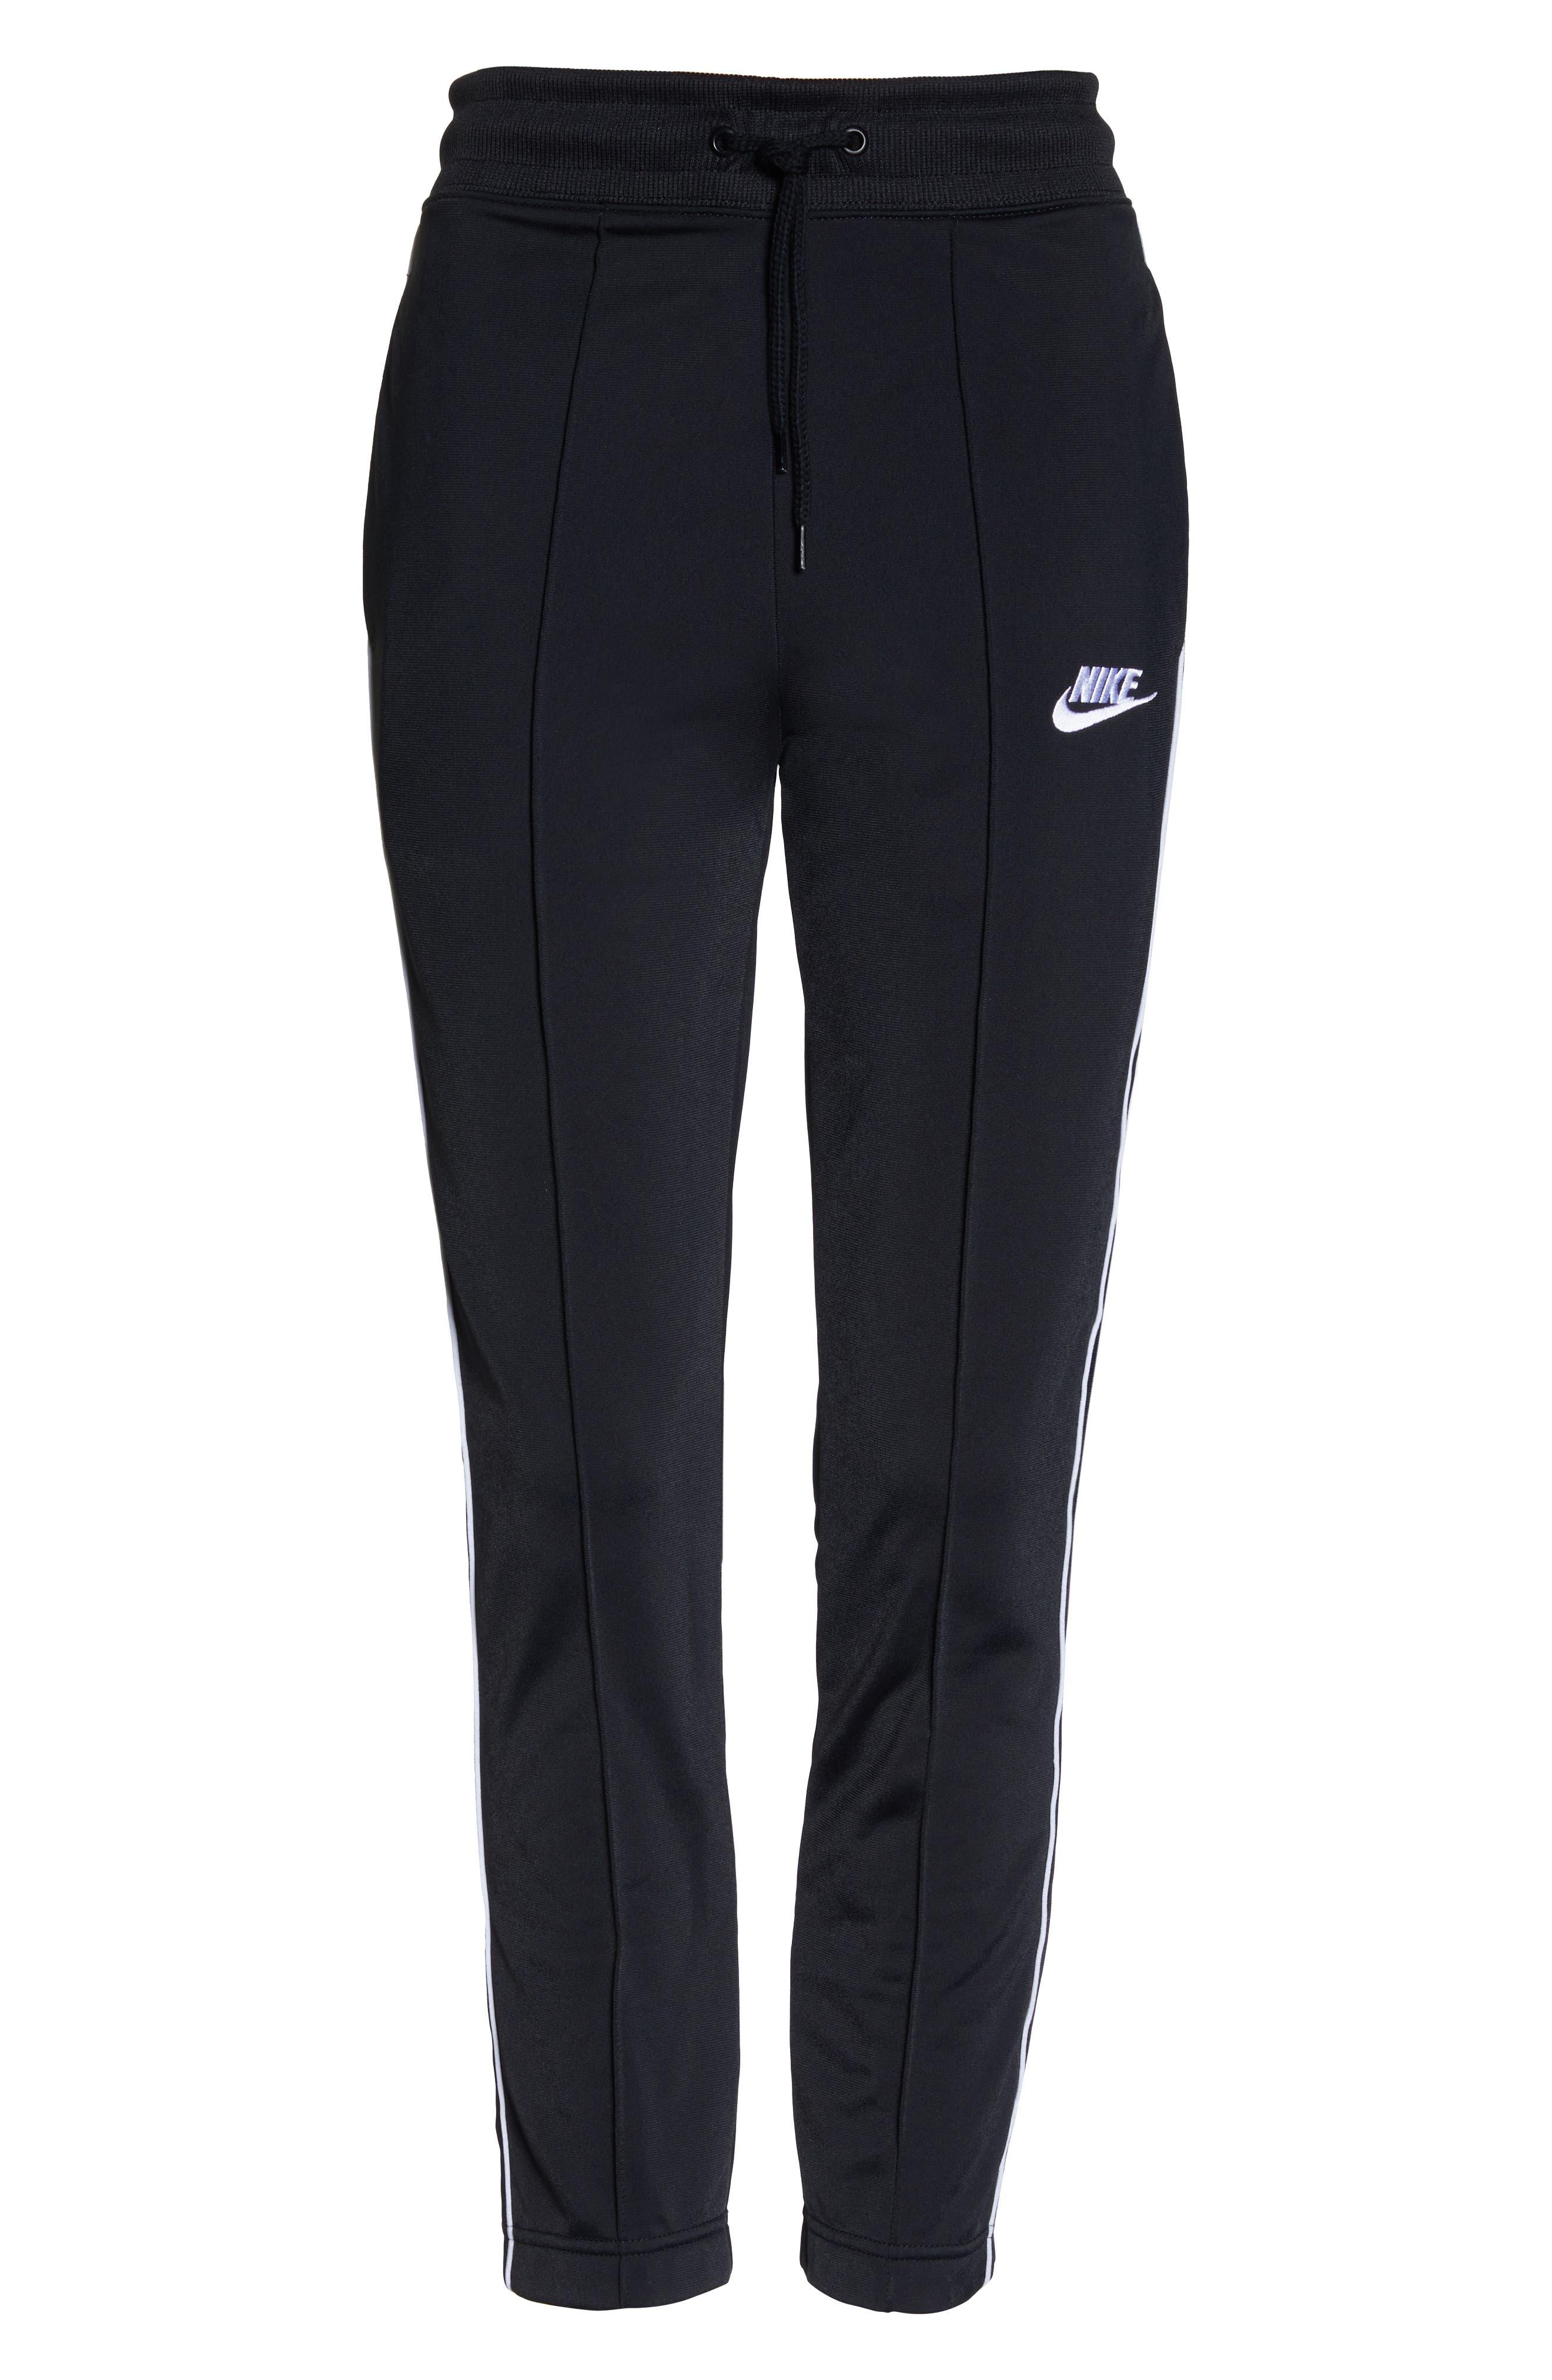 NIKE, NSW Slim Crop Pants, Alternate thumbnail 7, color, BLACK/ WHITE/ WHITE